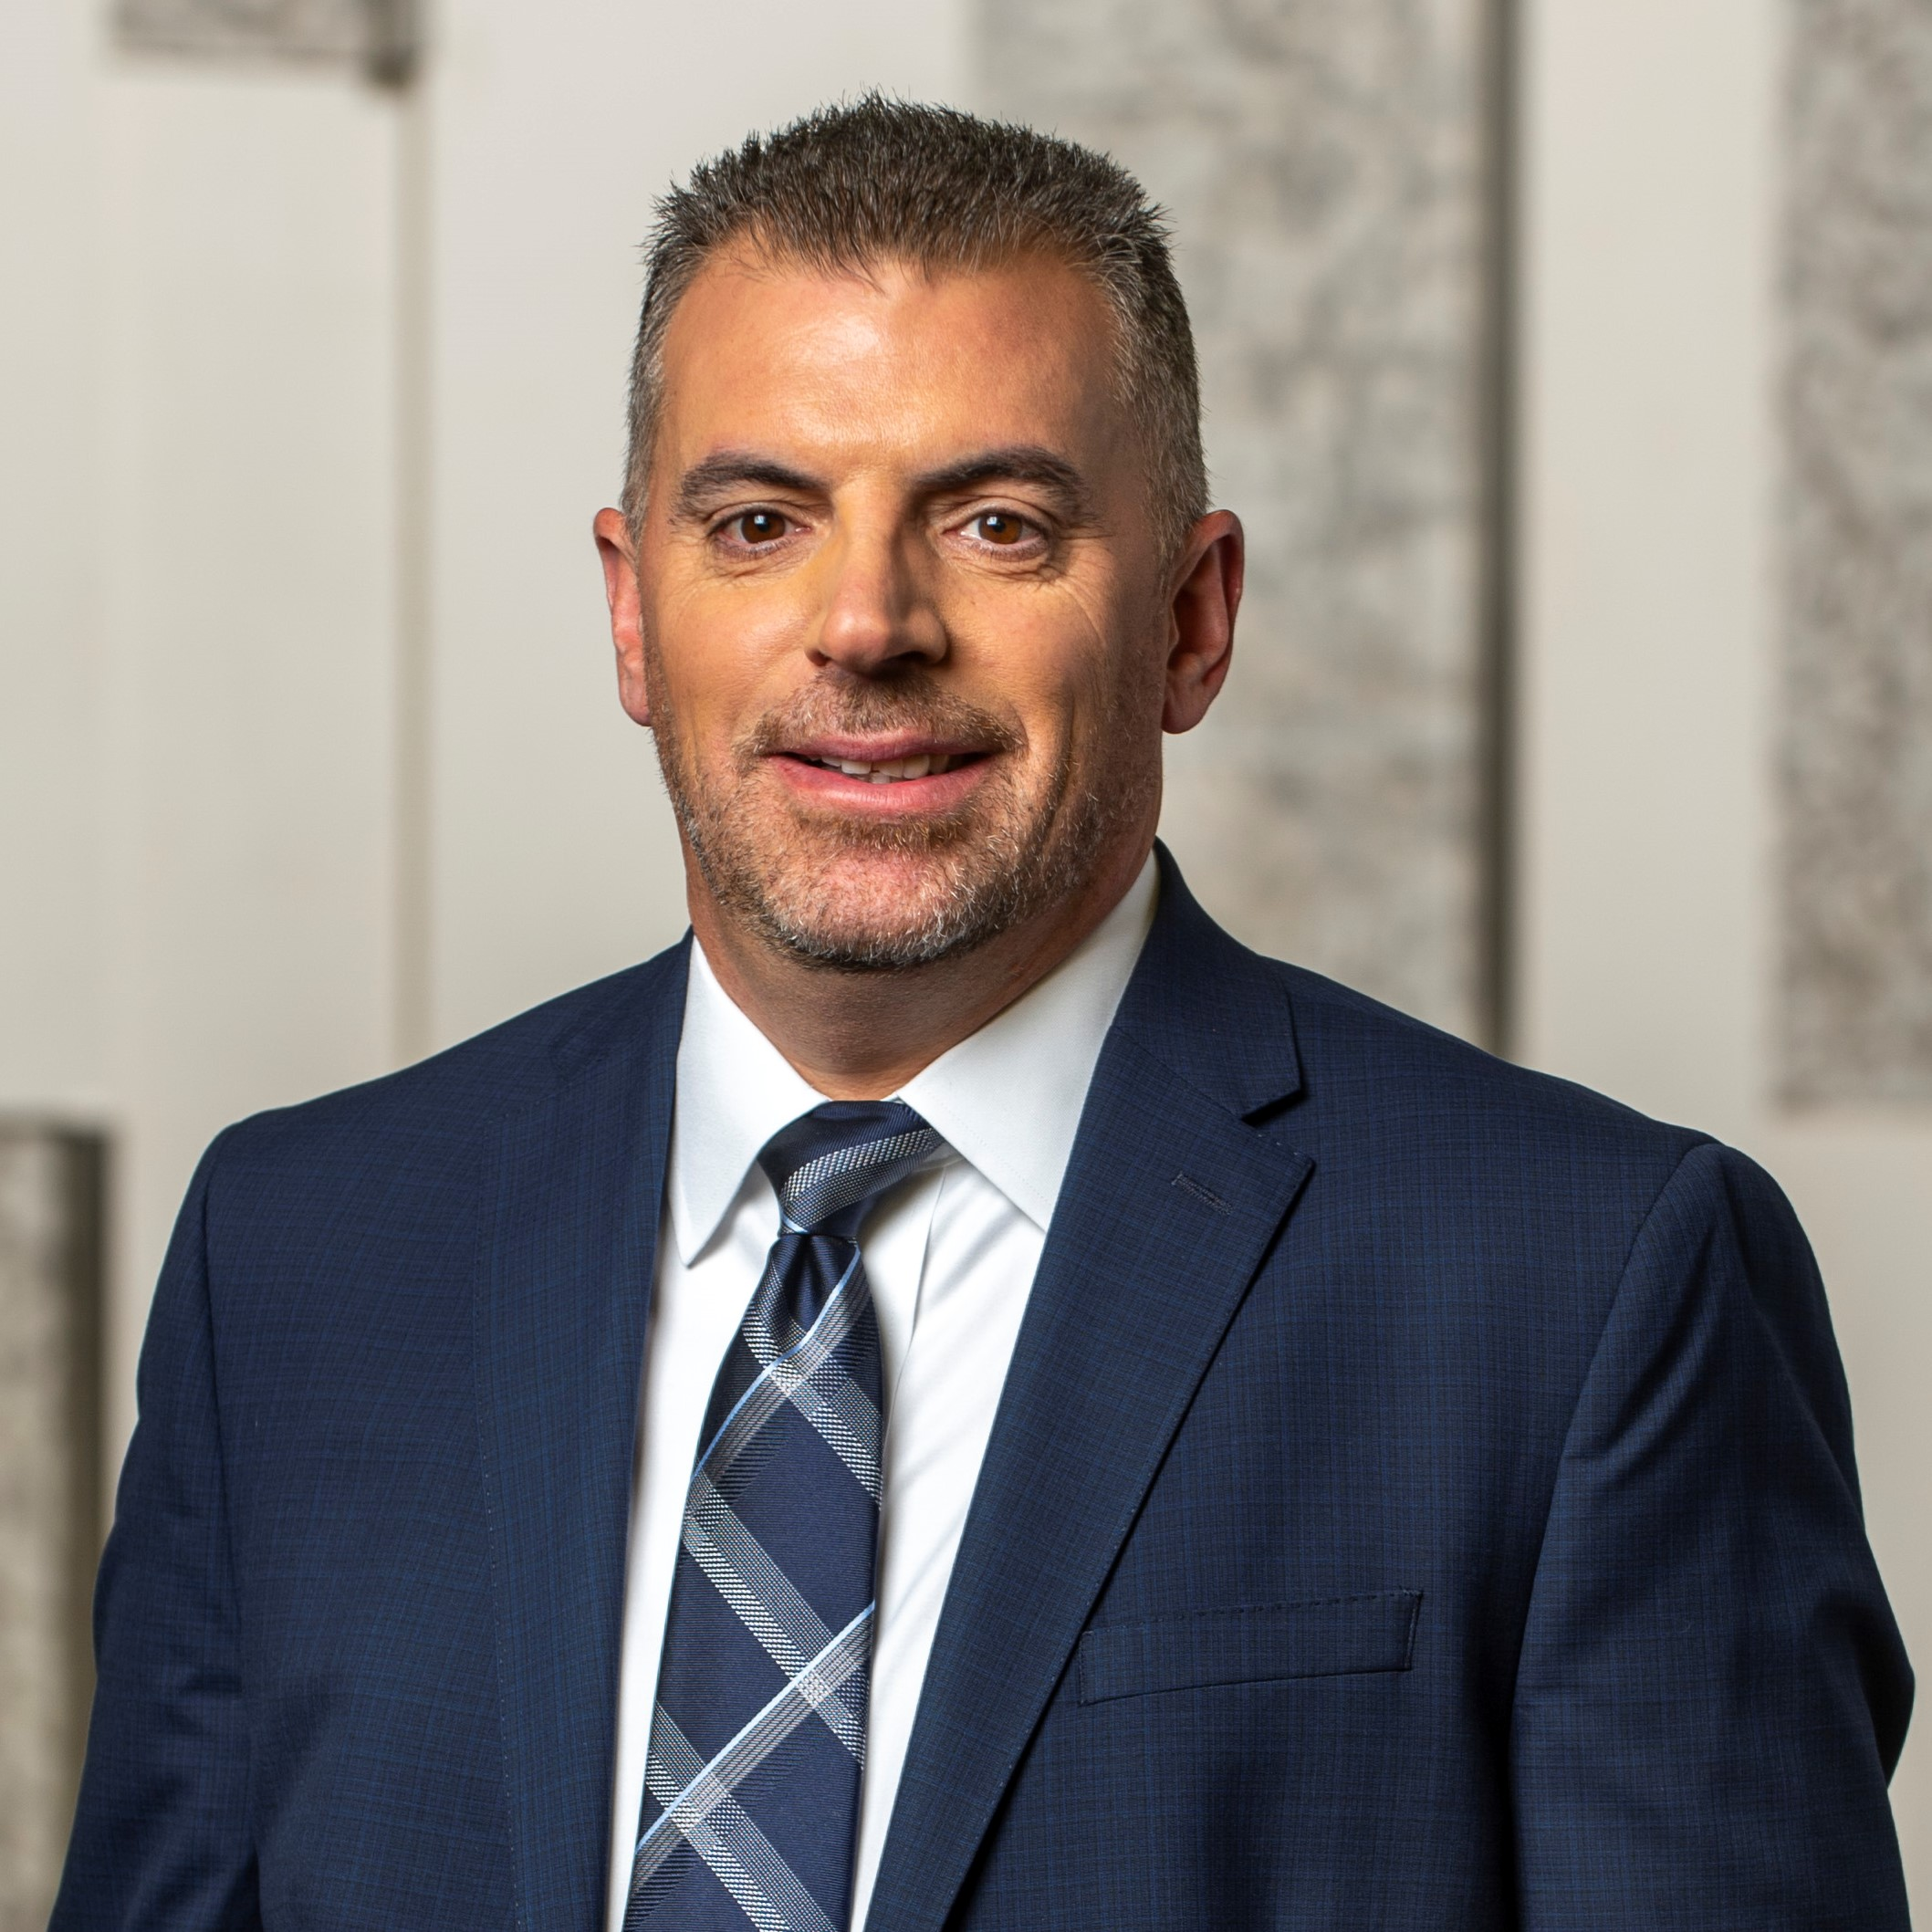 <hr></hr>Shawn Bradford (he/him) <br>Senior Vice President, Water Canada <br>EPCOR